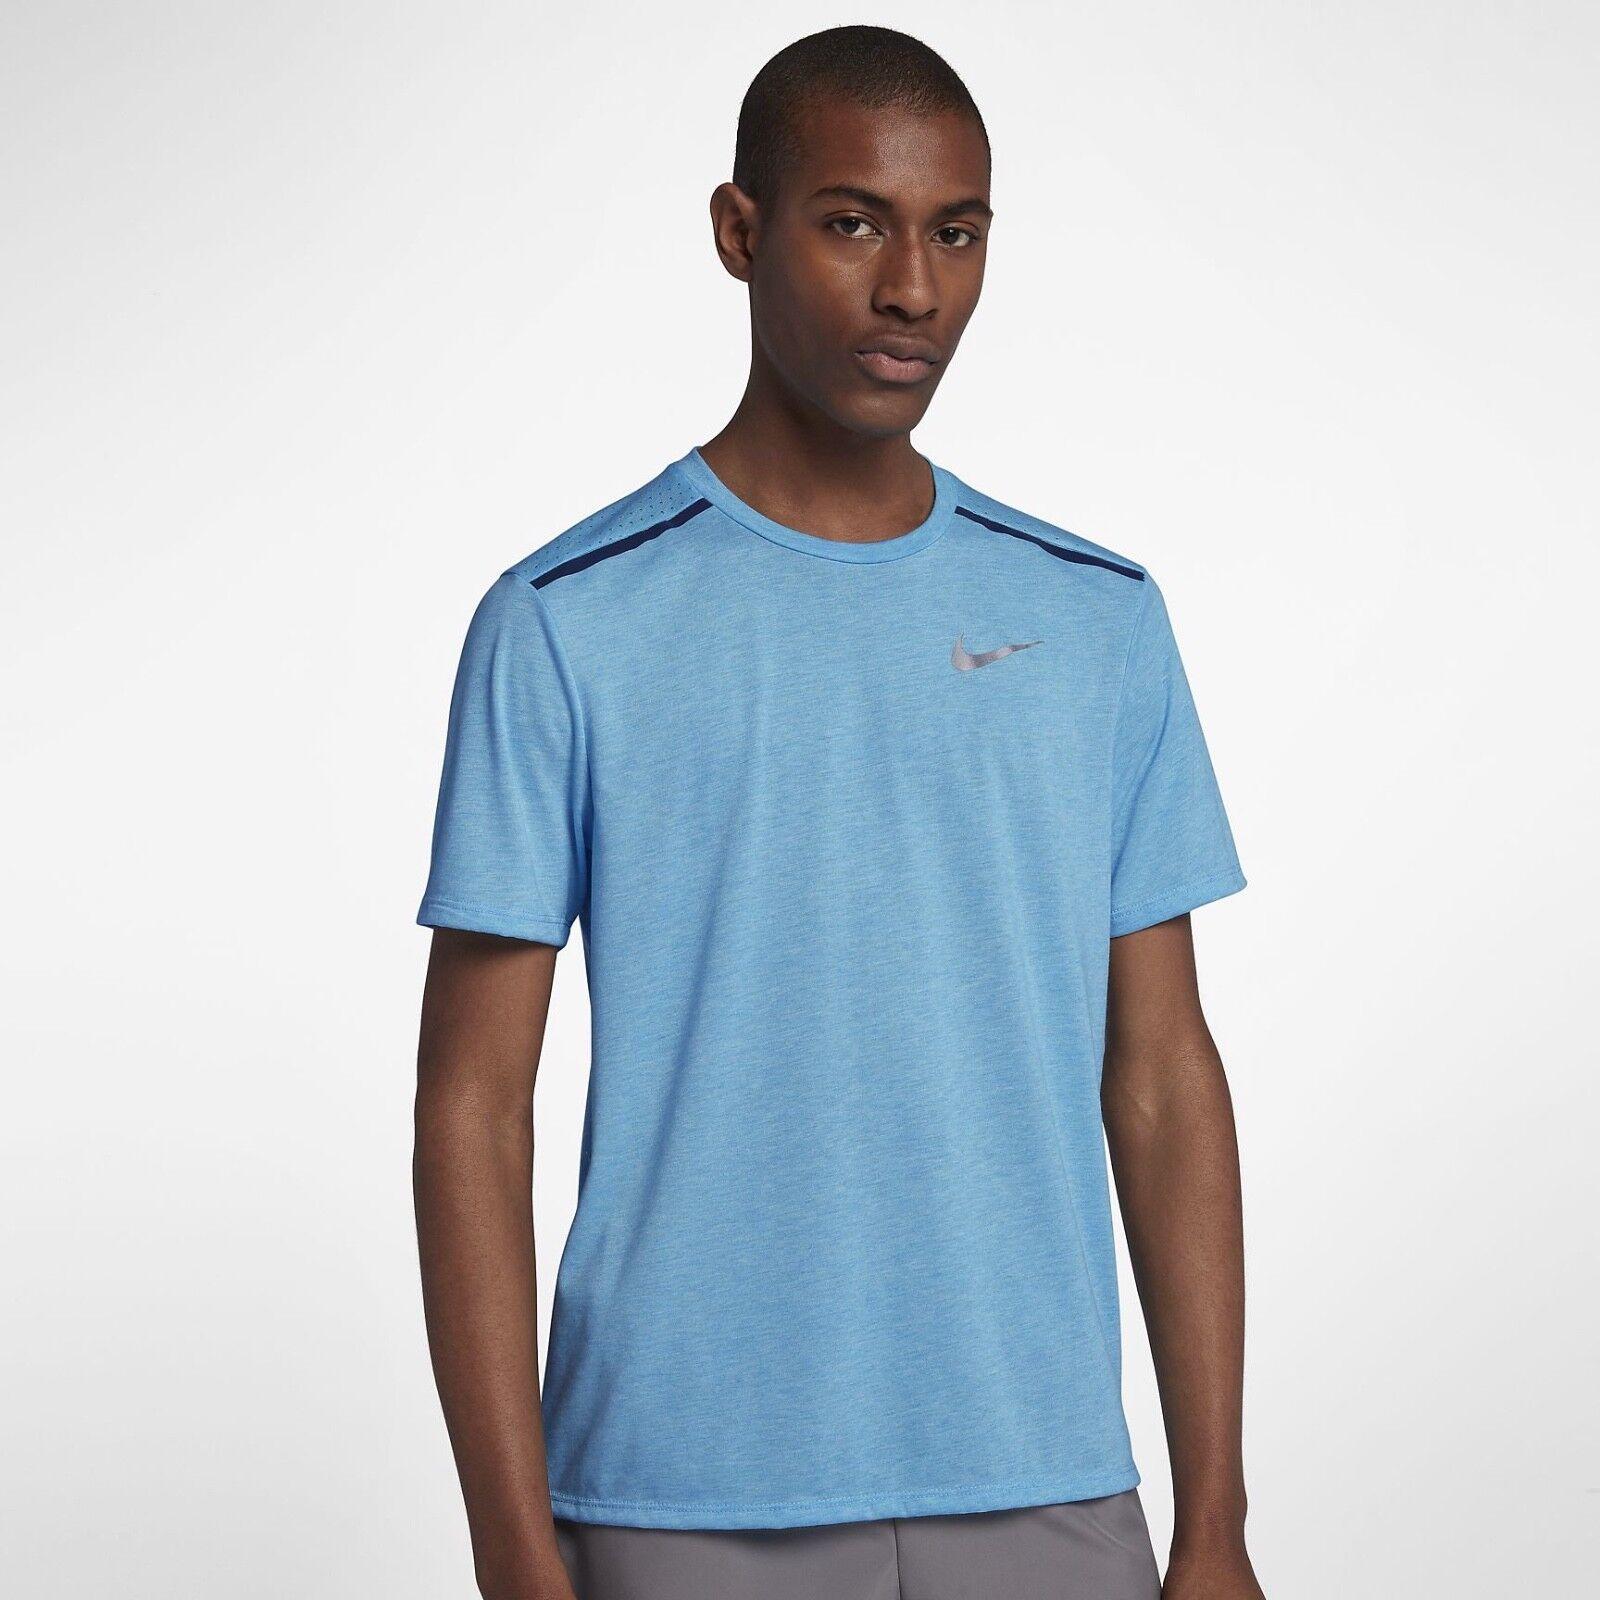 Mens NIKE RUNNING BREATHE Tailwind Shirt Size XL.      892813-482